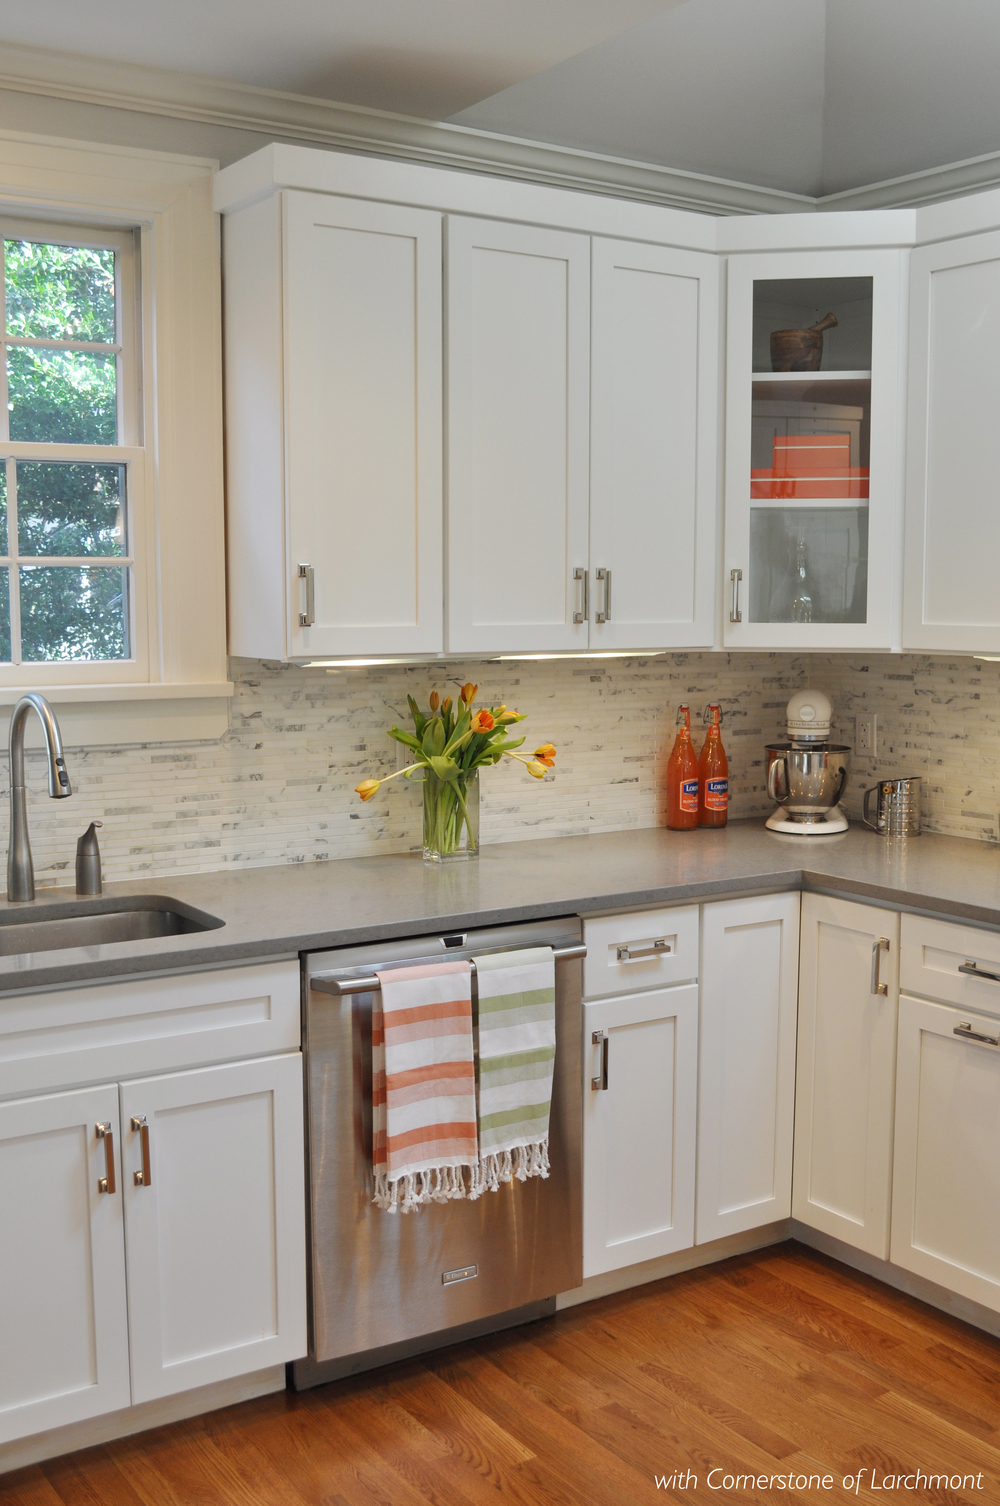 Kim Annick Mitchell_Interior Designer_Larchmont Kitchen_White Cabinets_Caesarstone Countertops_with Cornerstone of Larchmont.jpg